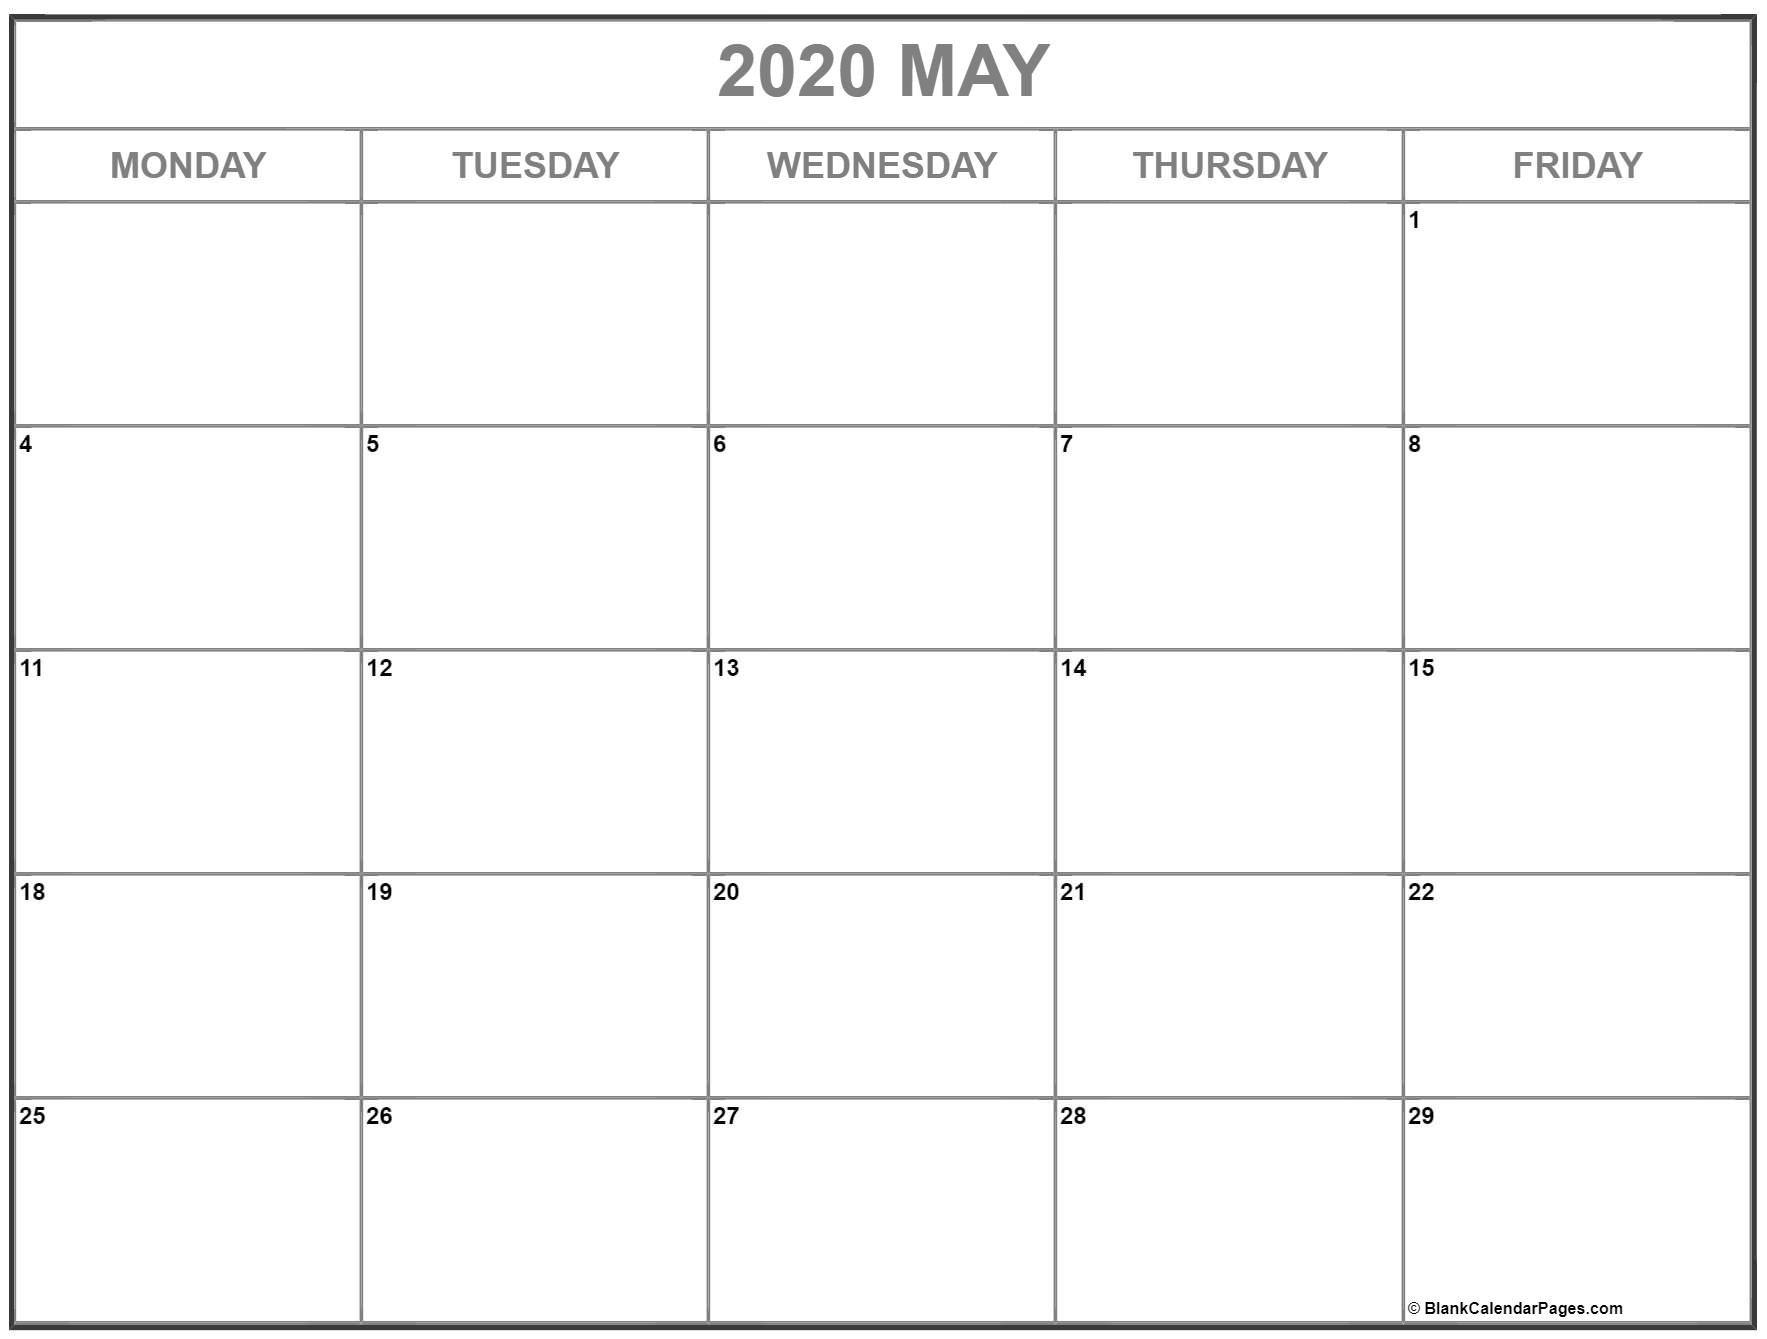 May 2020 Monday Calendar | Monday To Sunday Free Printable Monday To Friday Calendars